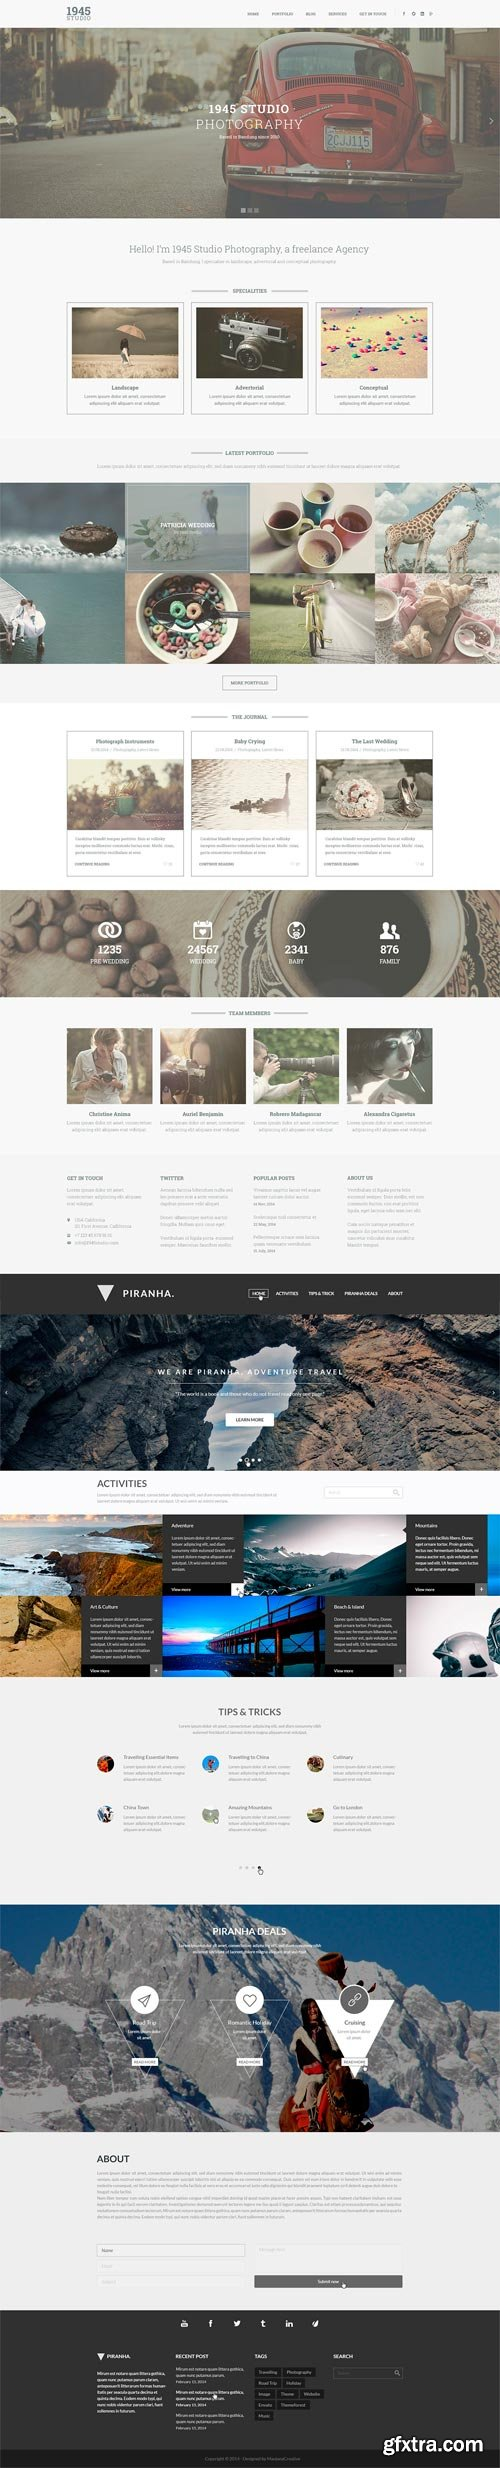 CM 102279 - BUNDLE - Clean PSD Website Template